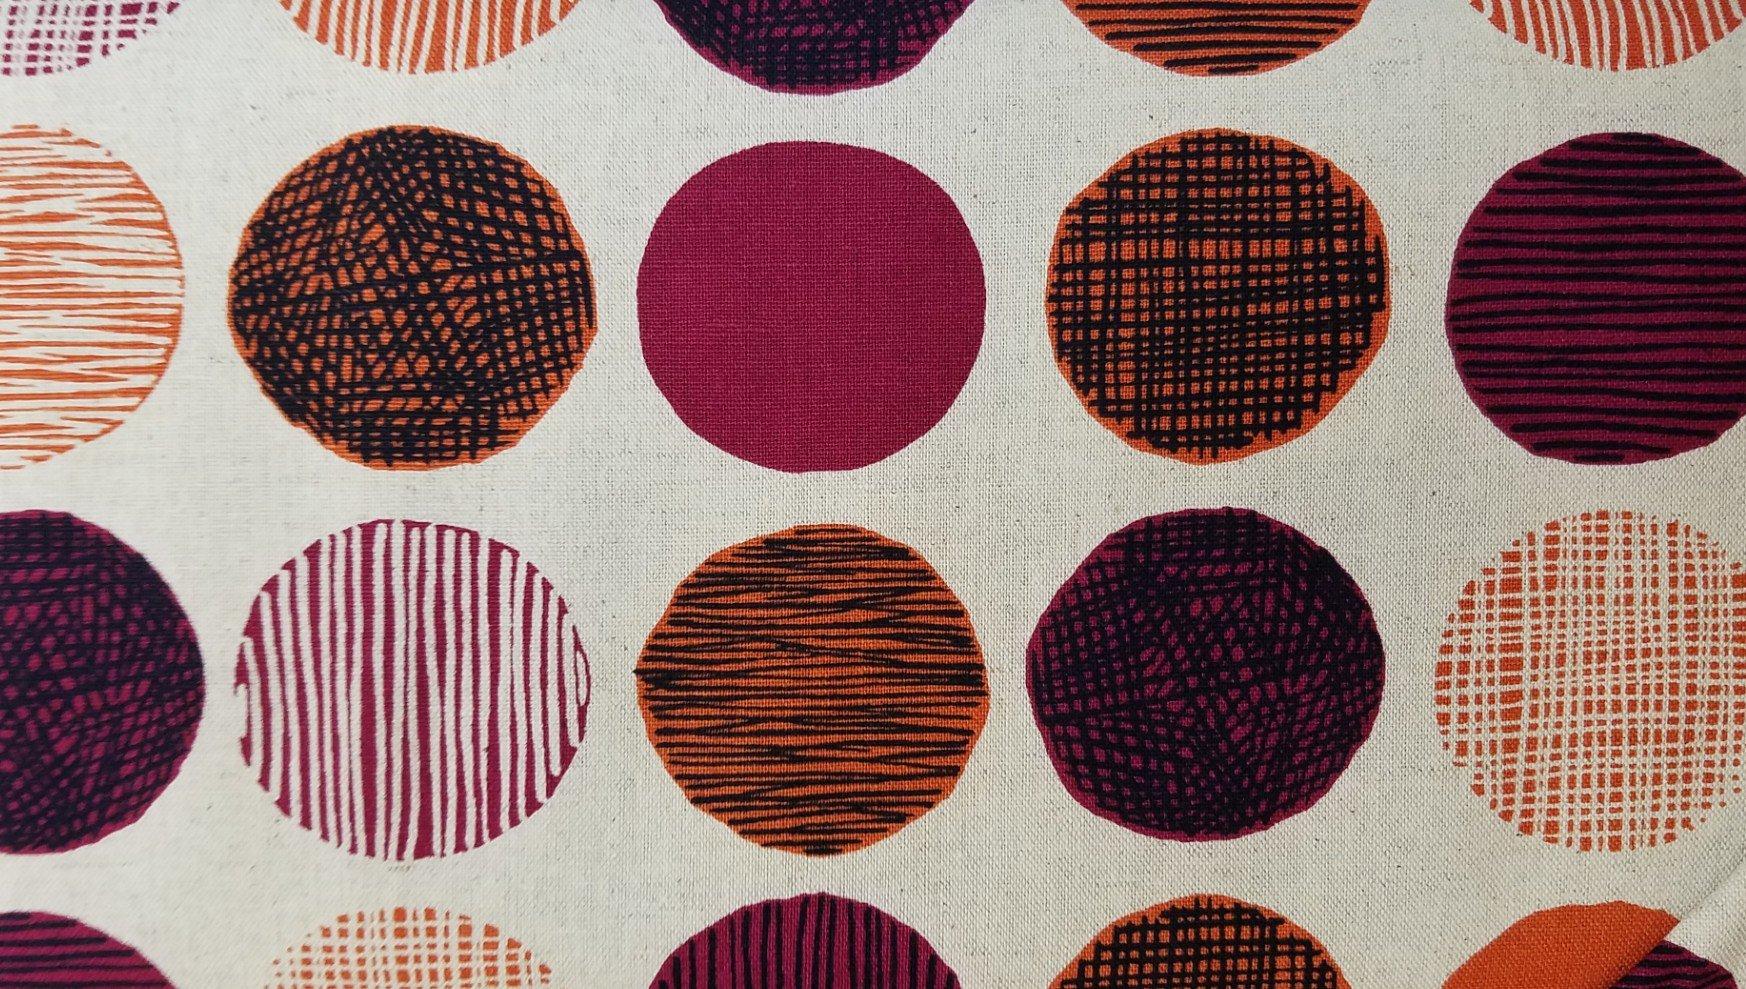 Hishiei Textiles Burgundy Circles